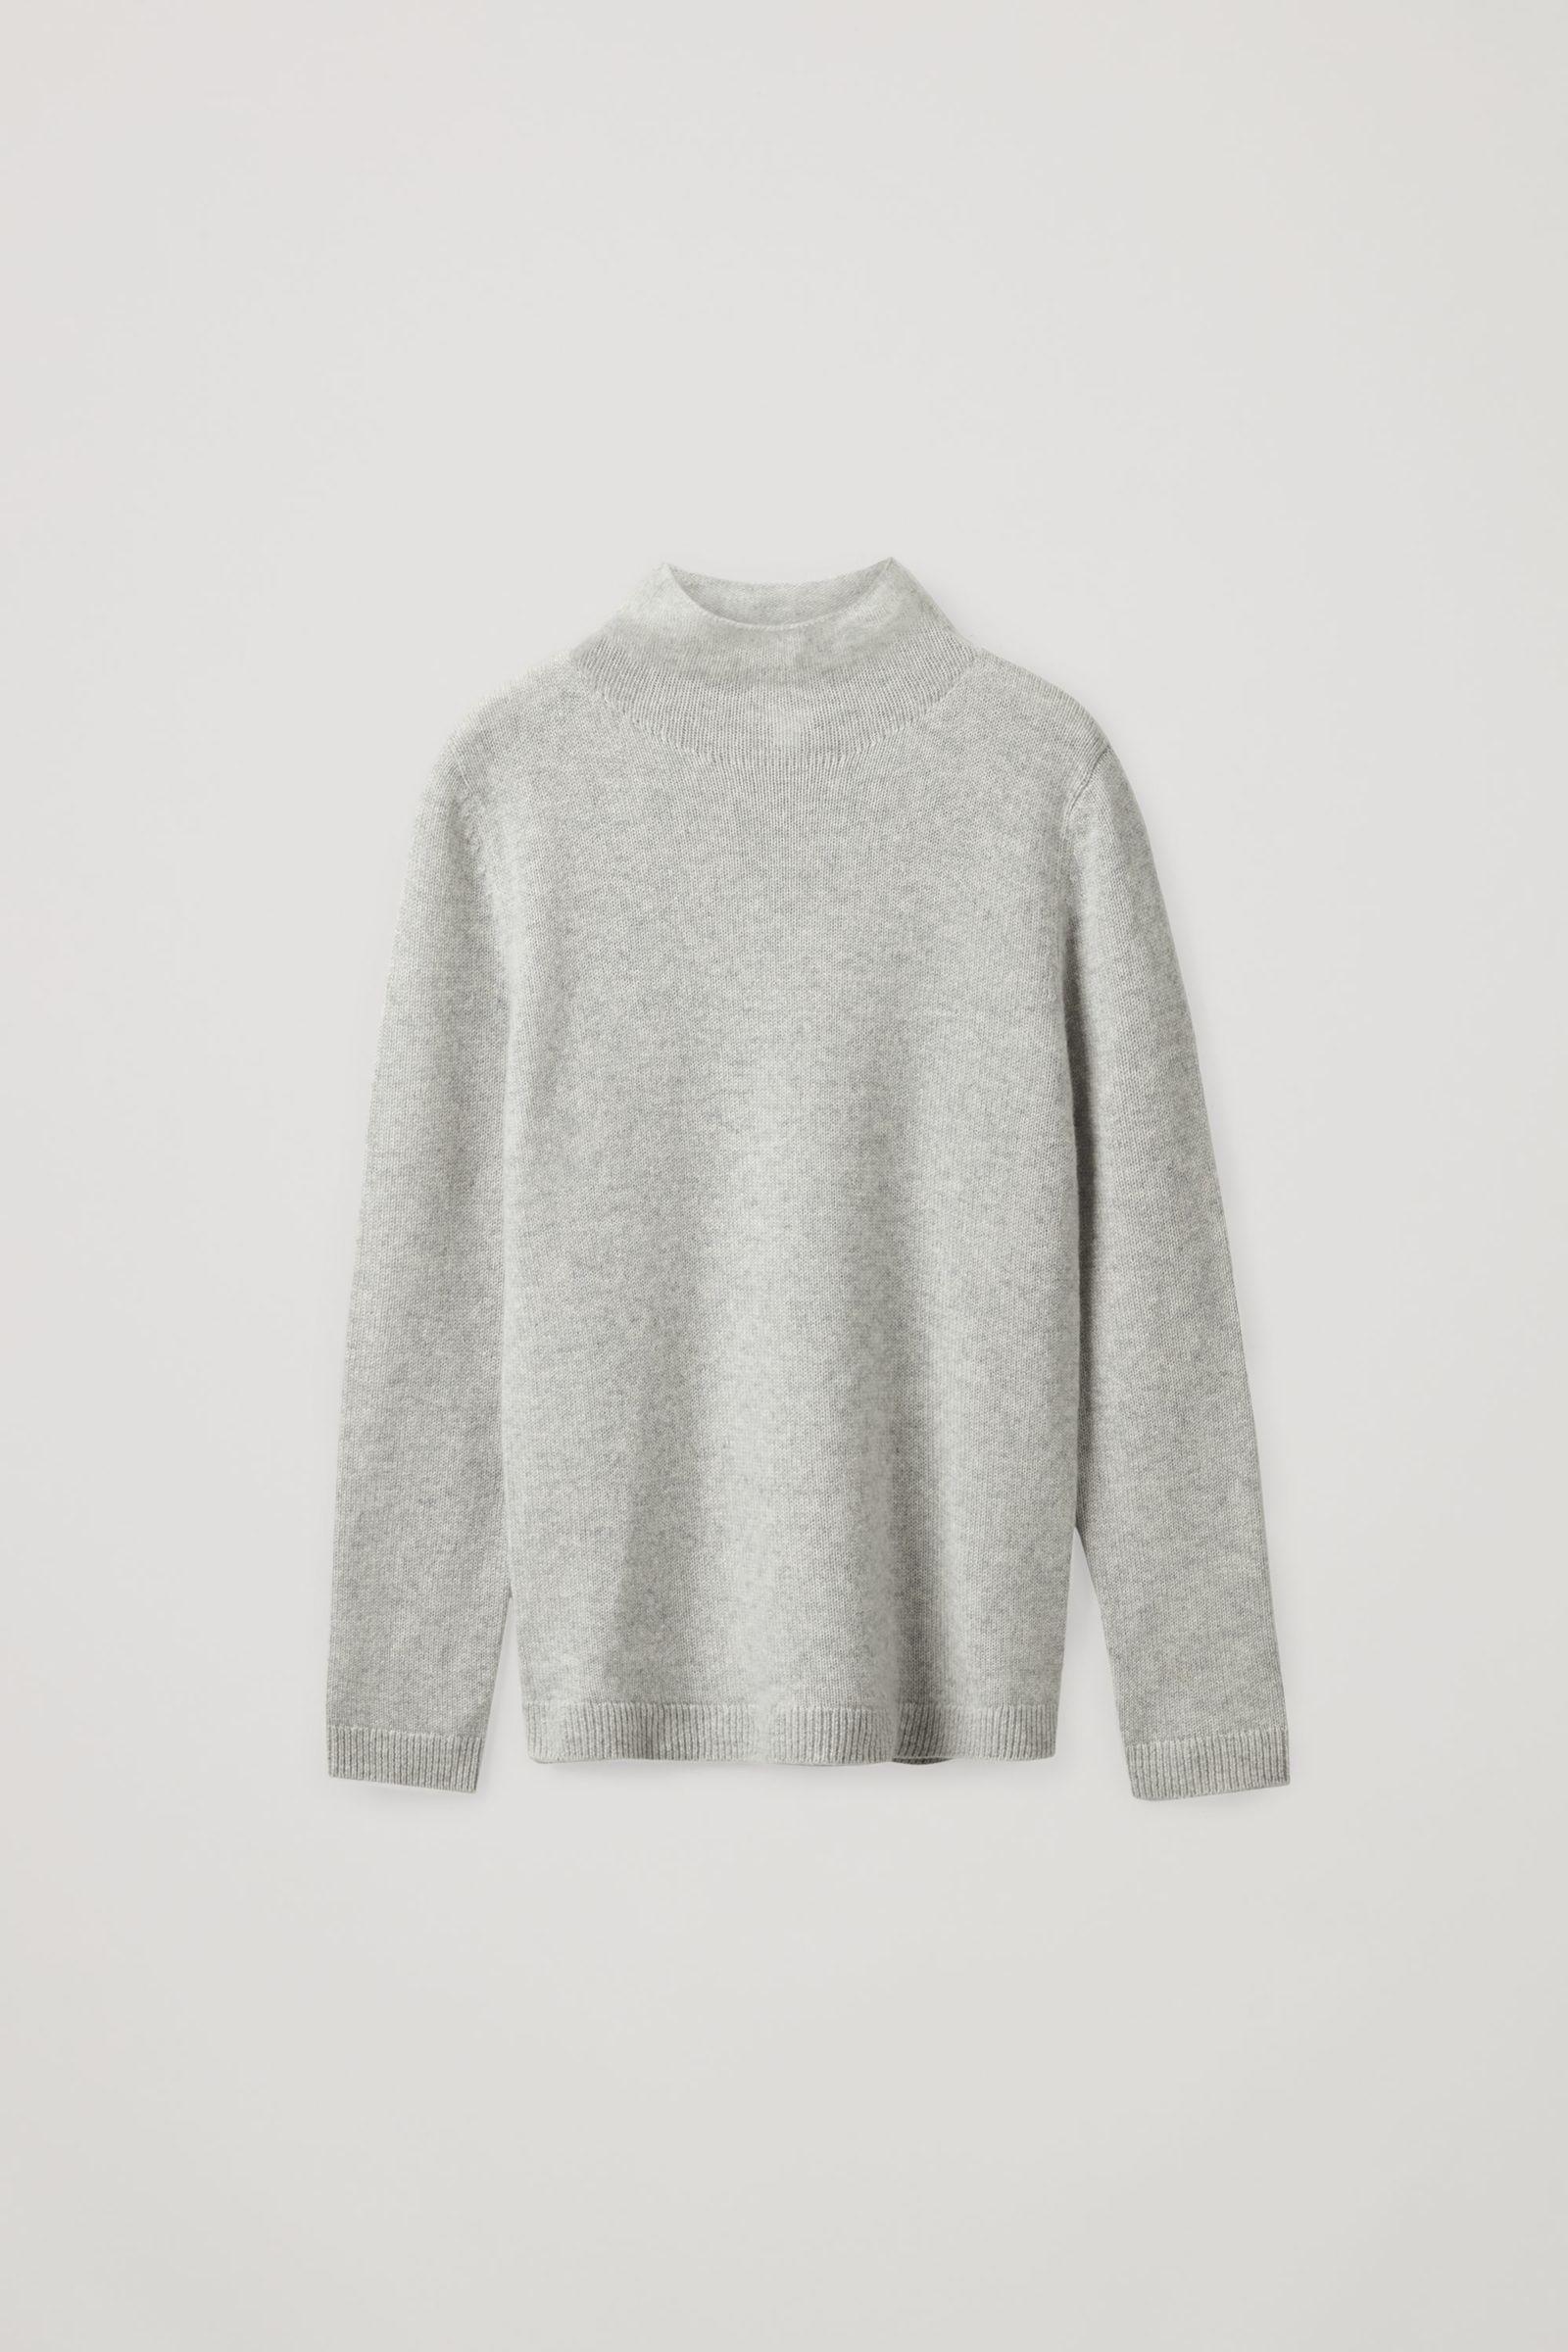 COS 니티드 캐시미어 스웨터의 몰 그레이컬러 Product입니다.